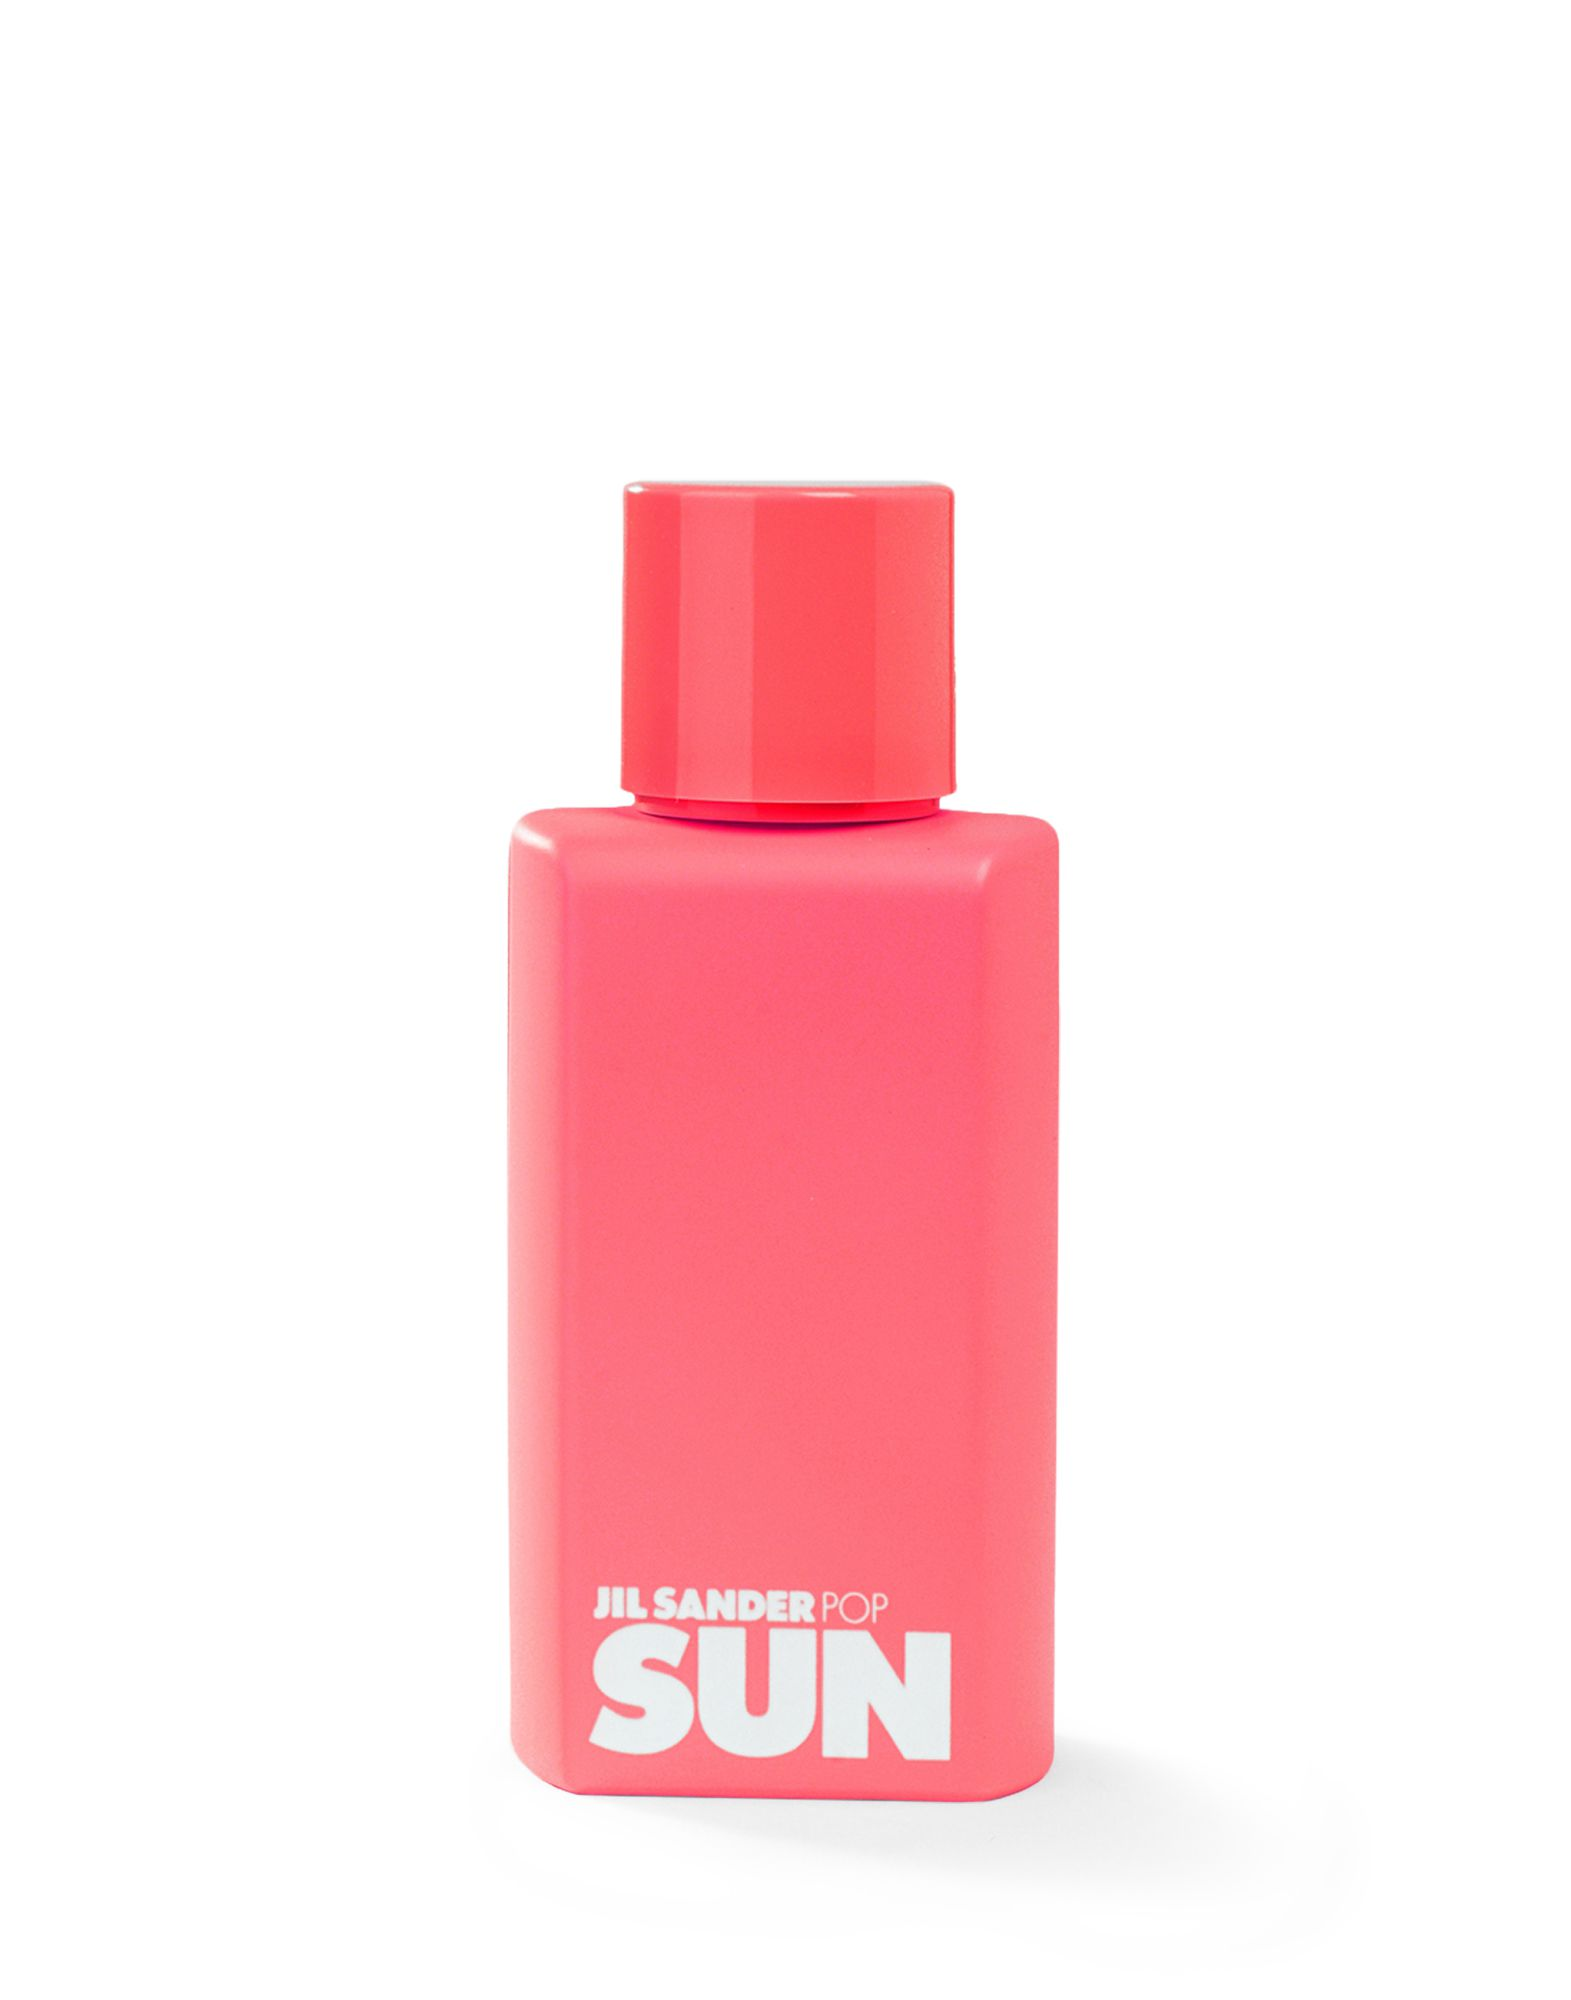 SUN POP - JIL SANDER Online Store